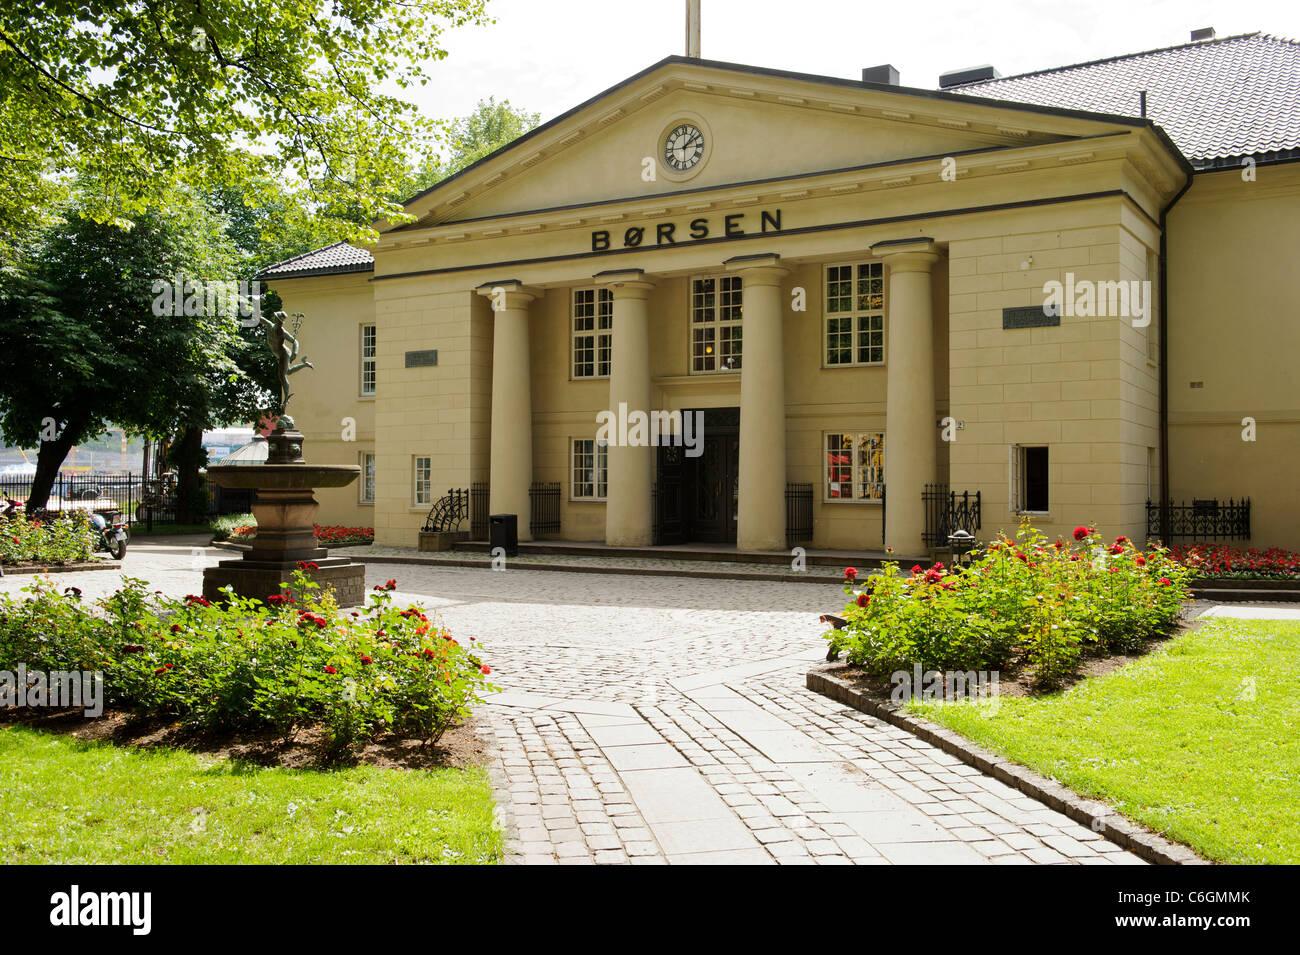 Oslo Borsen - Stock Image